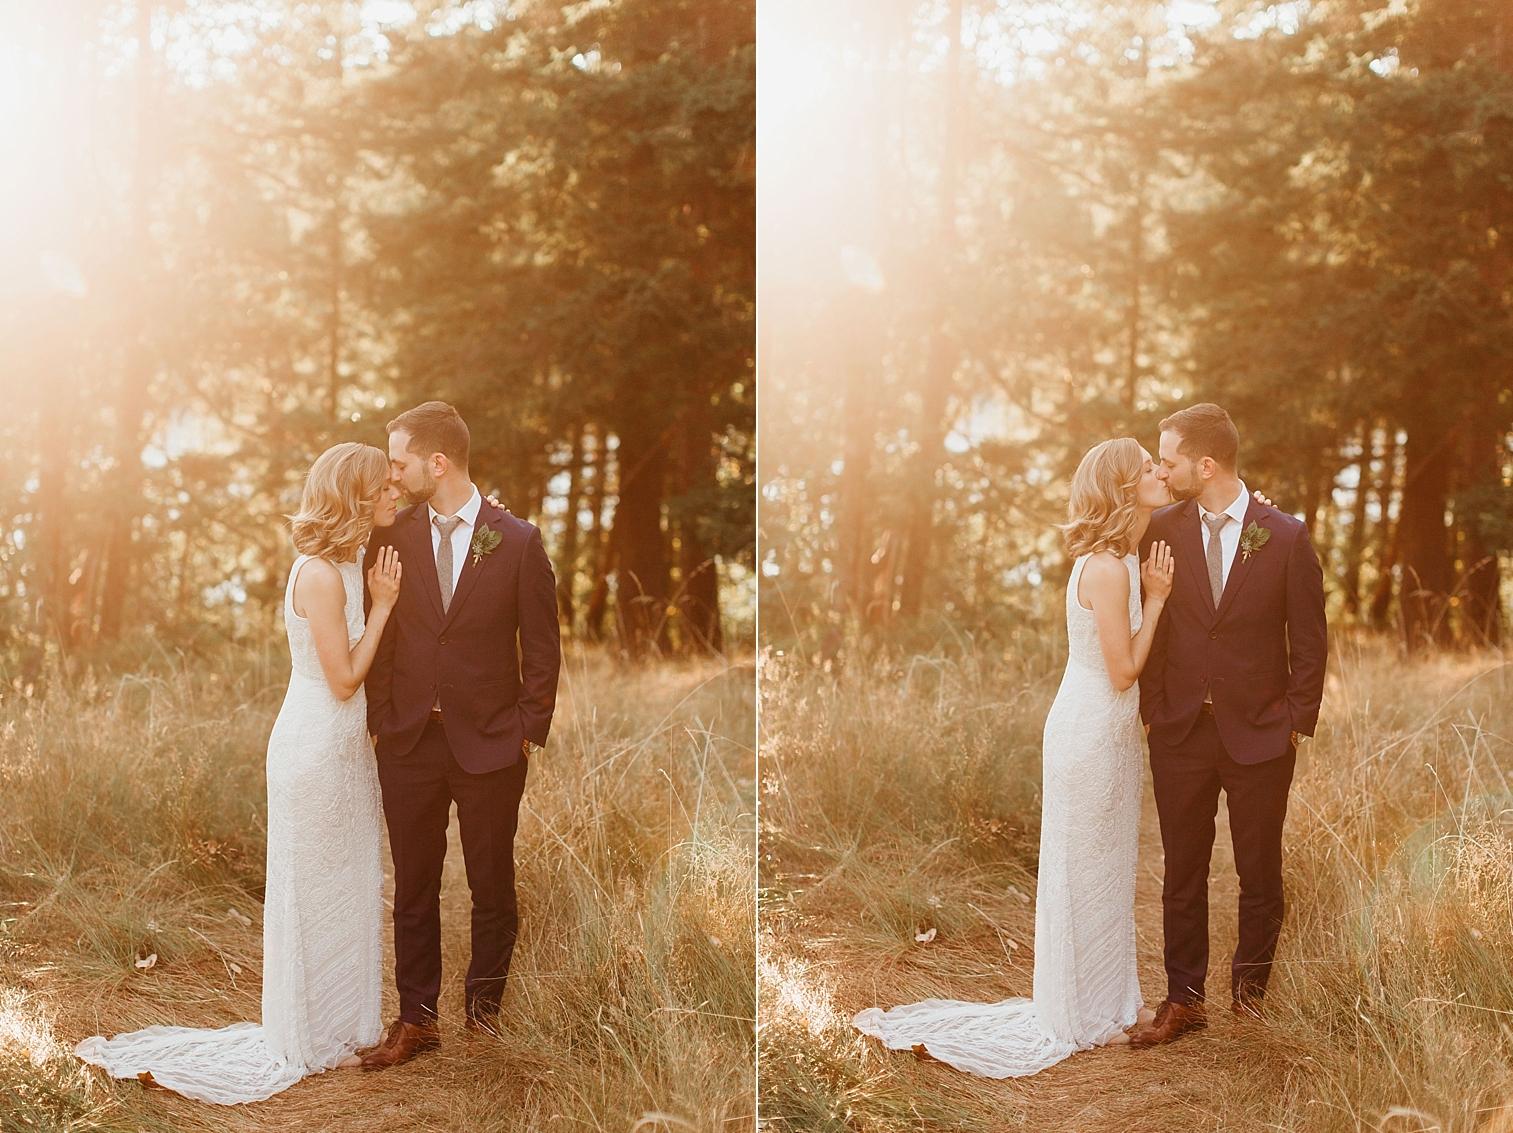 Woodstock-Farm-Bellingham-Wedding-114.jpg